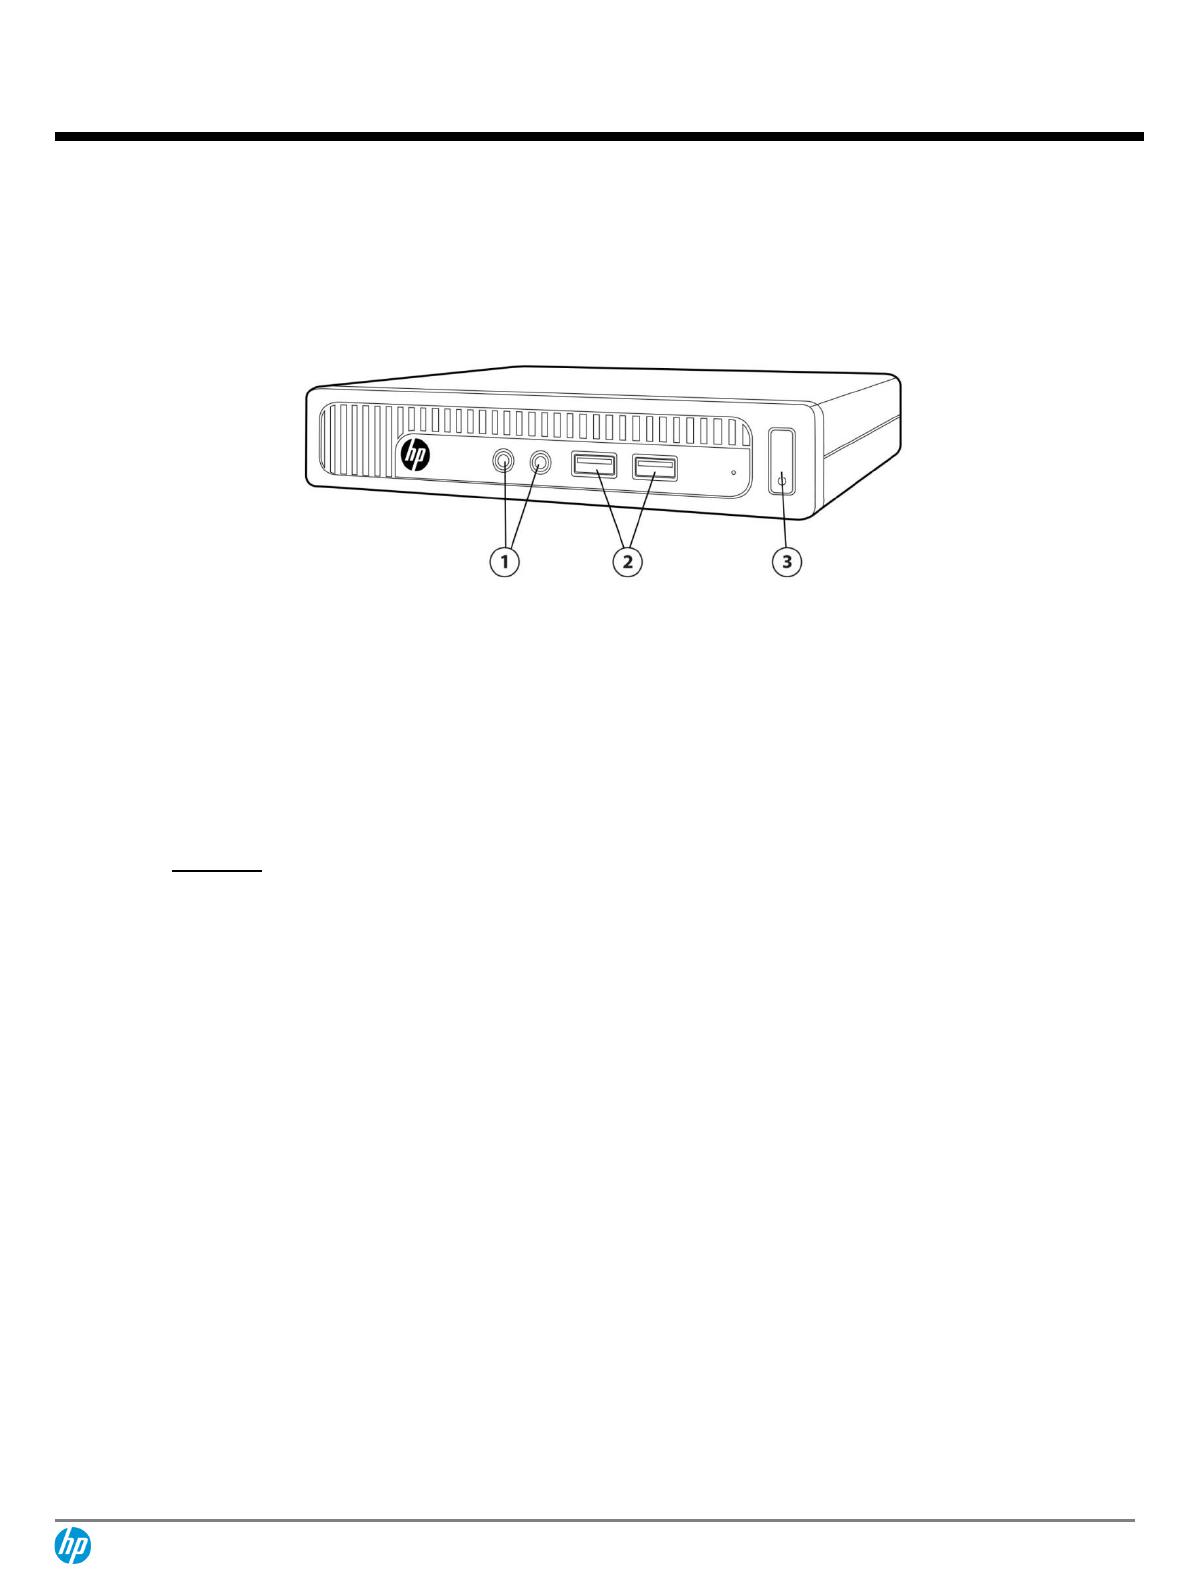 Sick VS-M12MSD-RJ45-931//5,0 SKR Ethernet Cable New